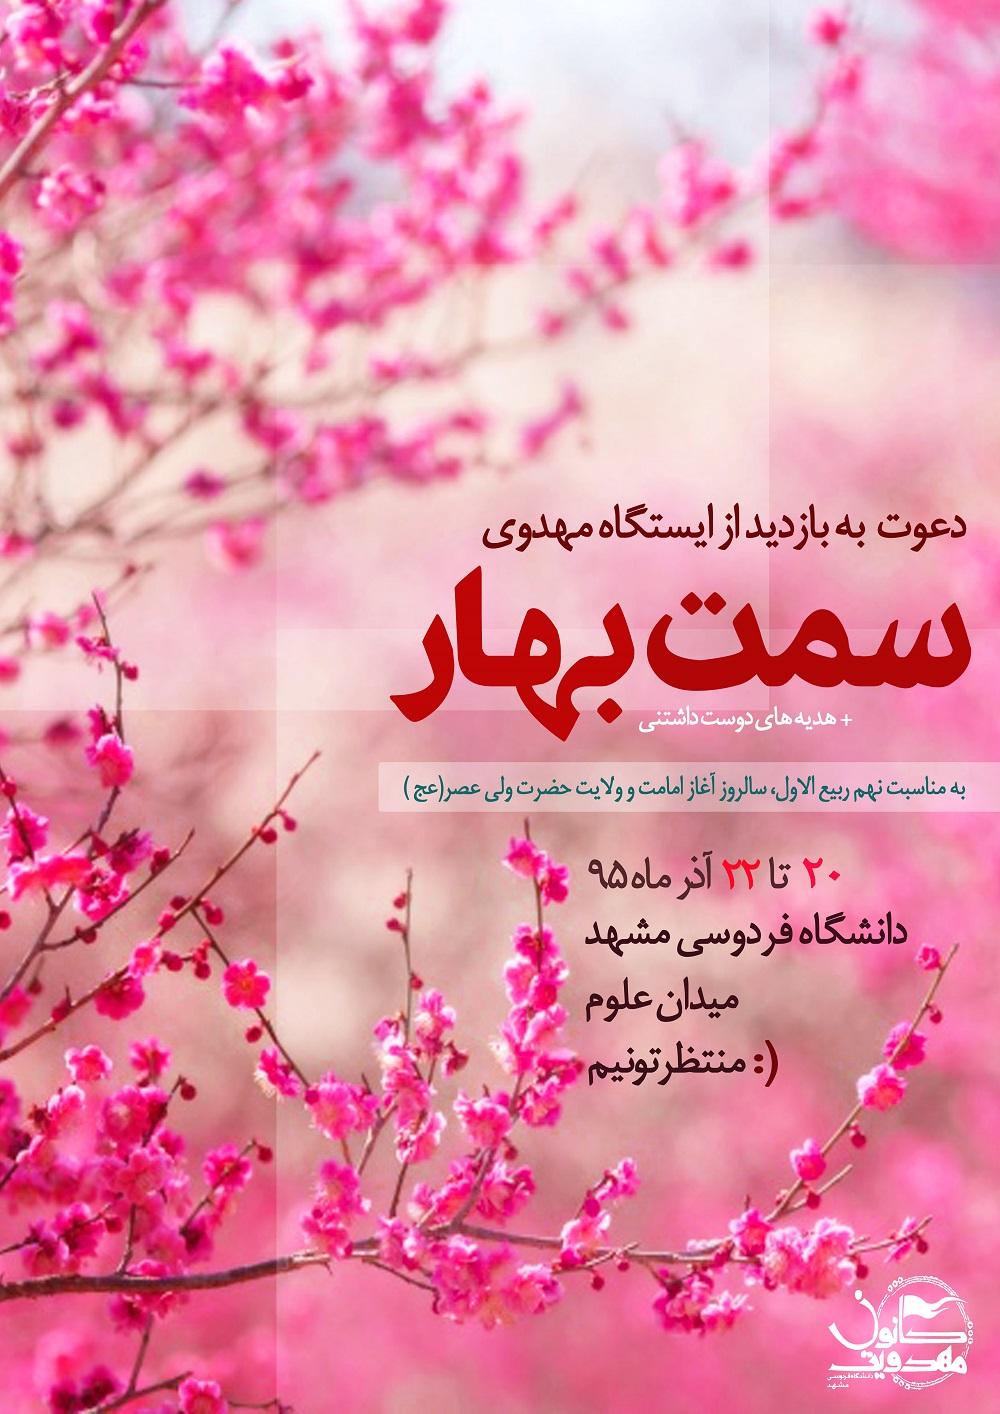 http://bayanbox.ir/view/8135645636847091267/ghorfe1..jpg